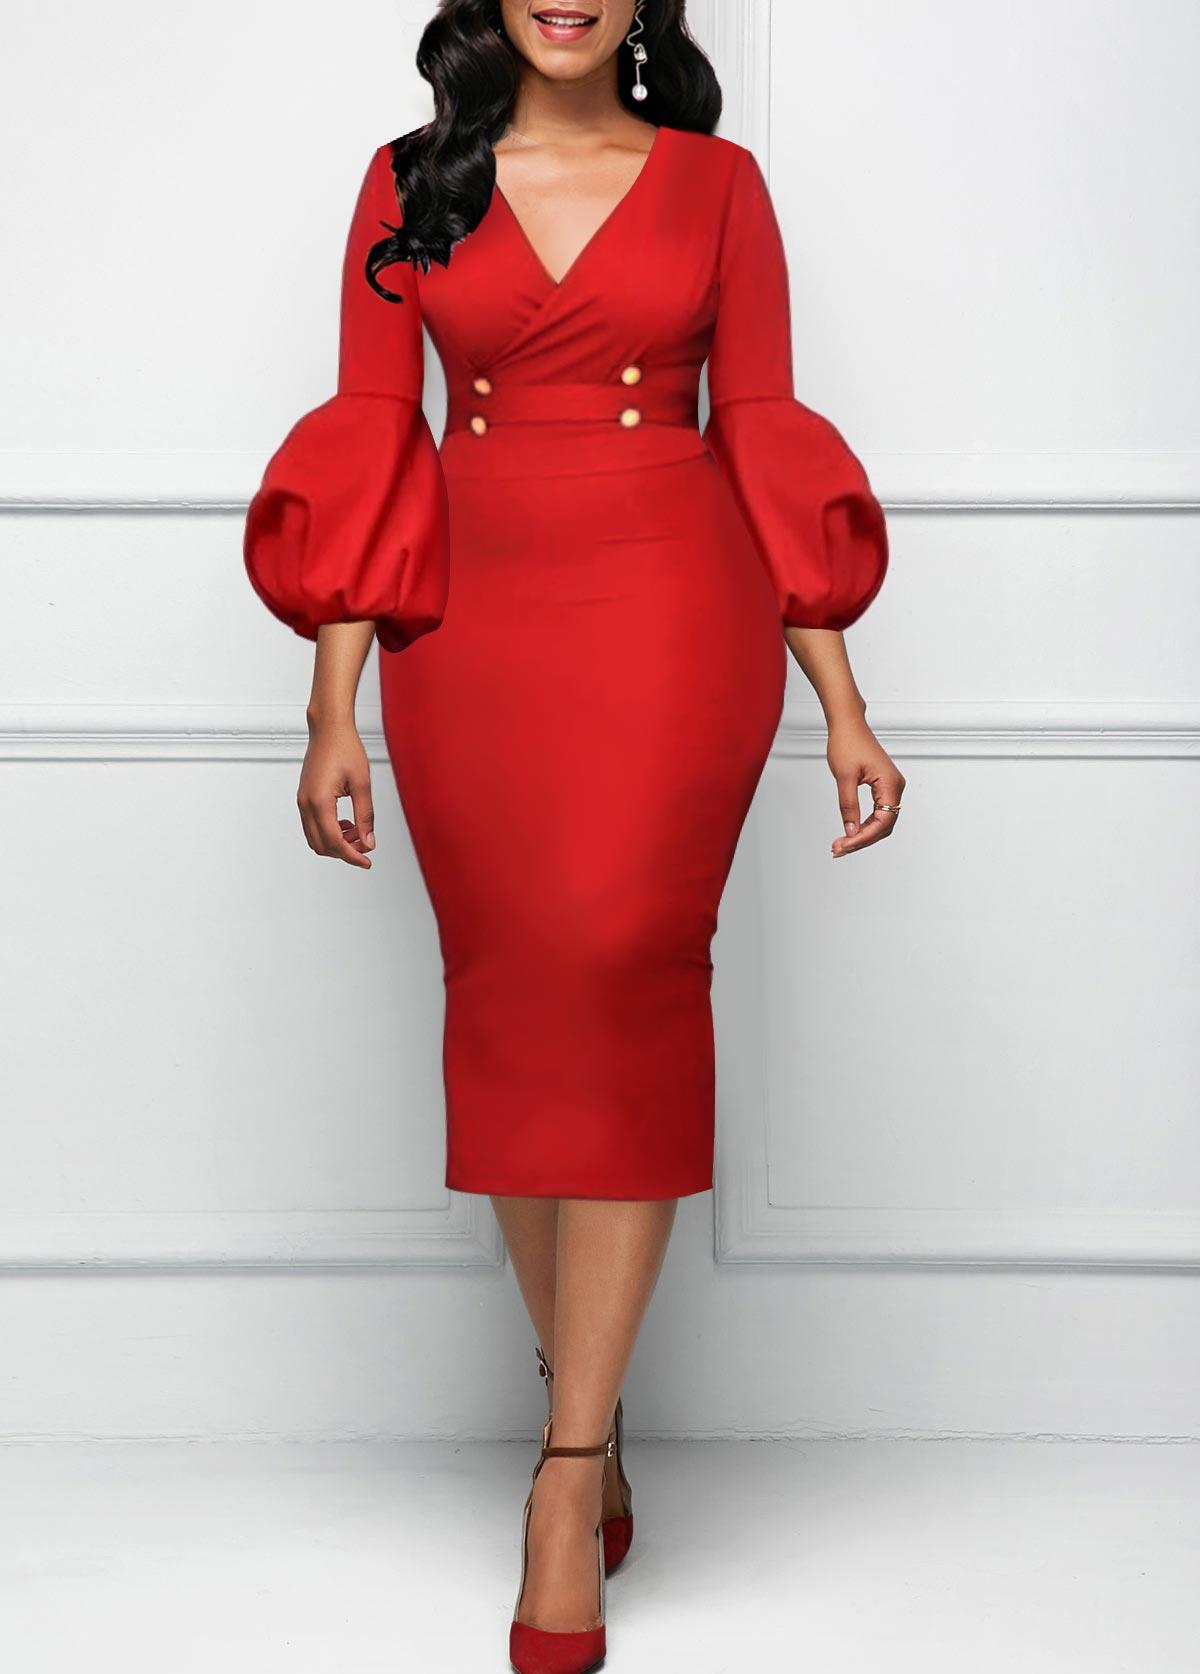 V Neck High Waist Red Dress